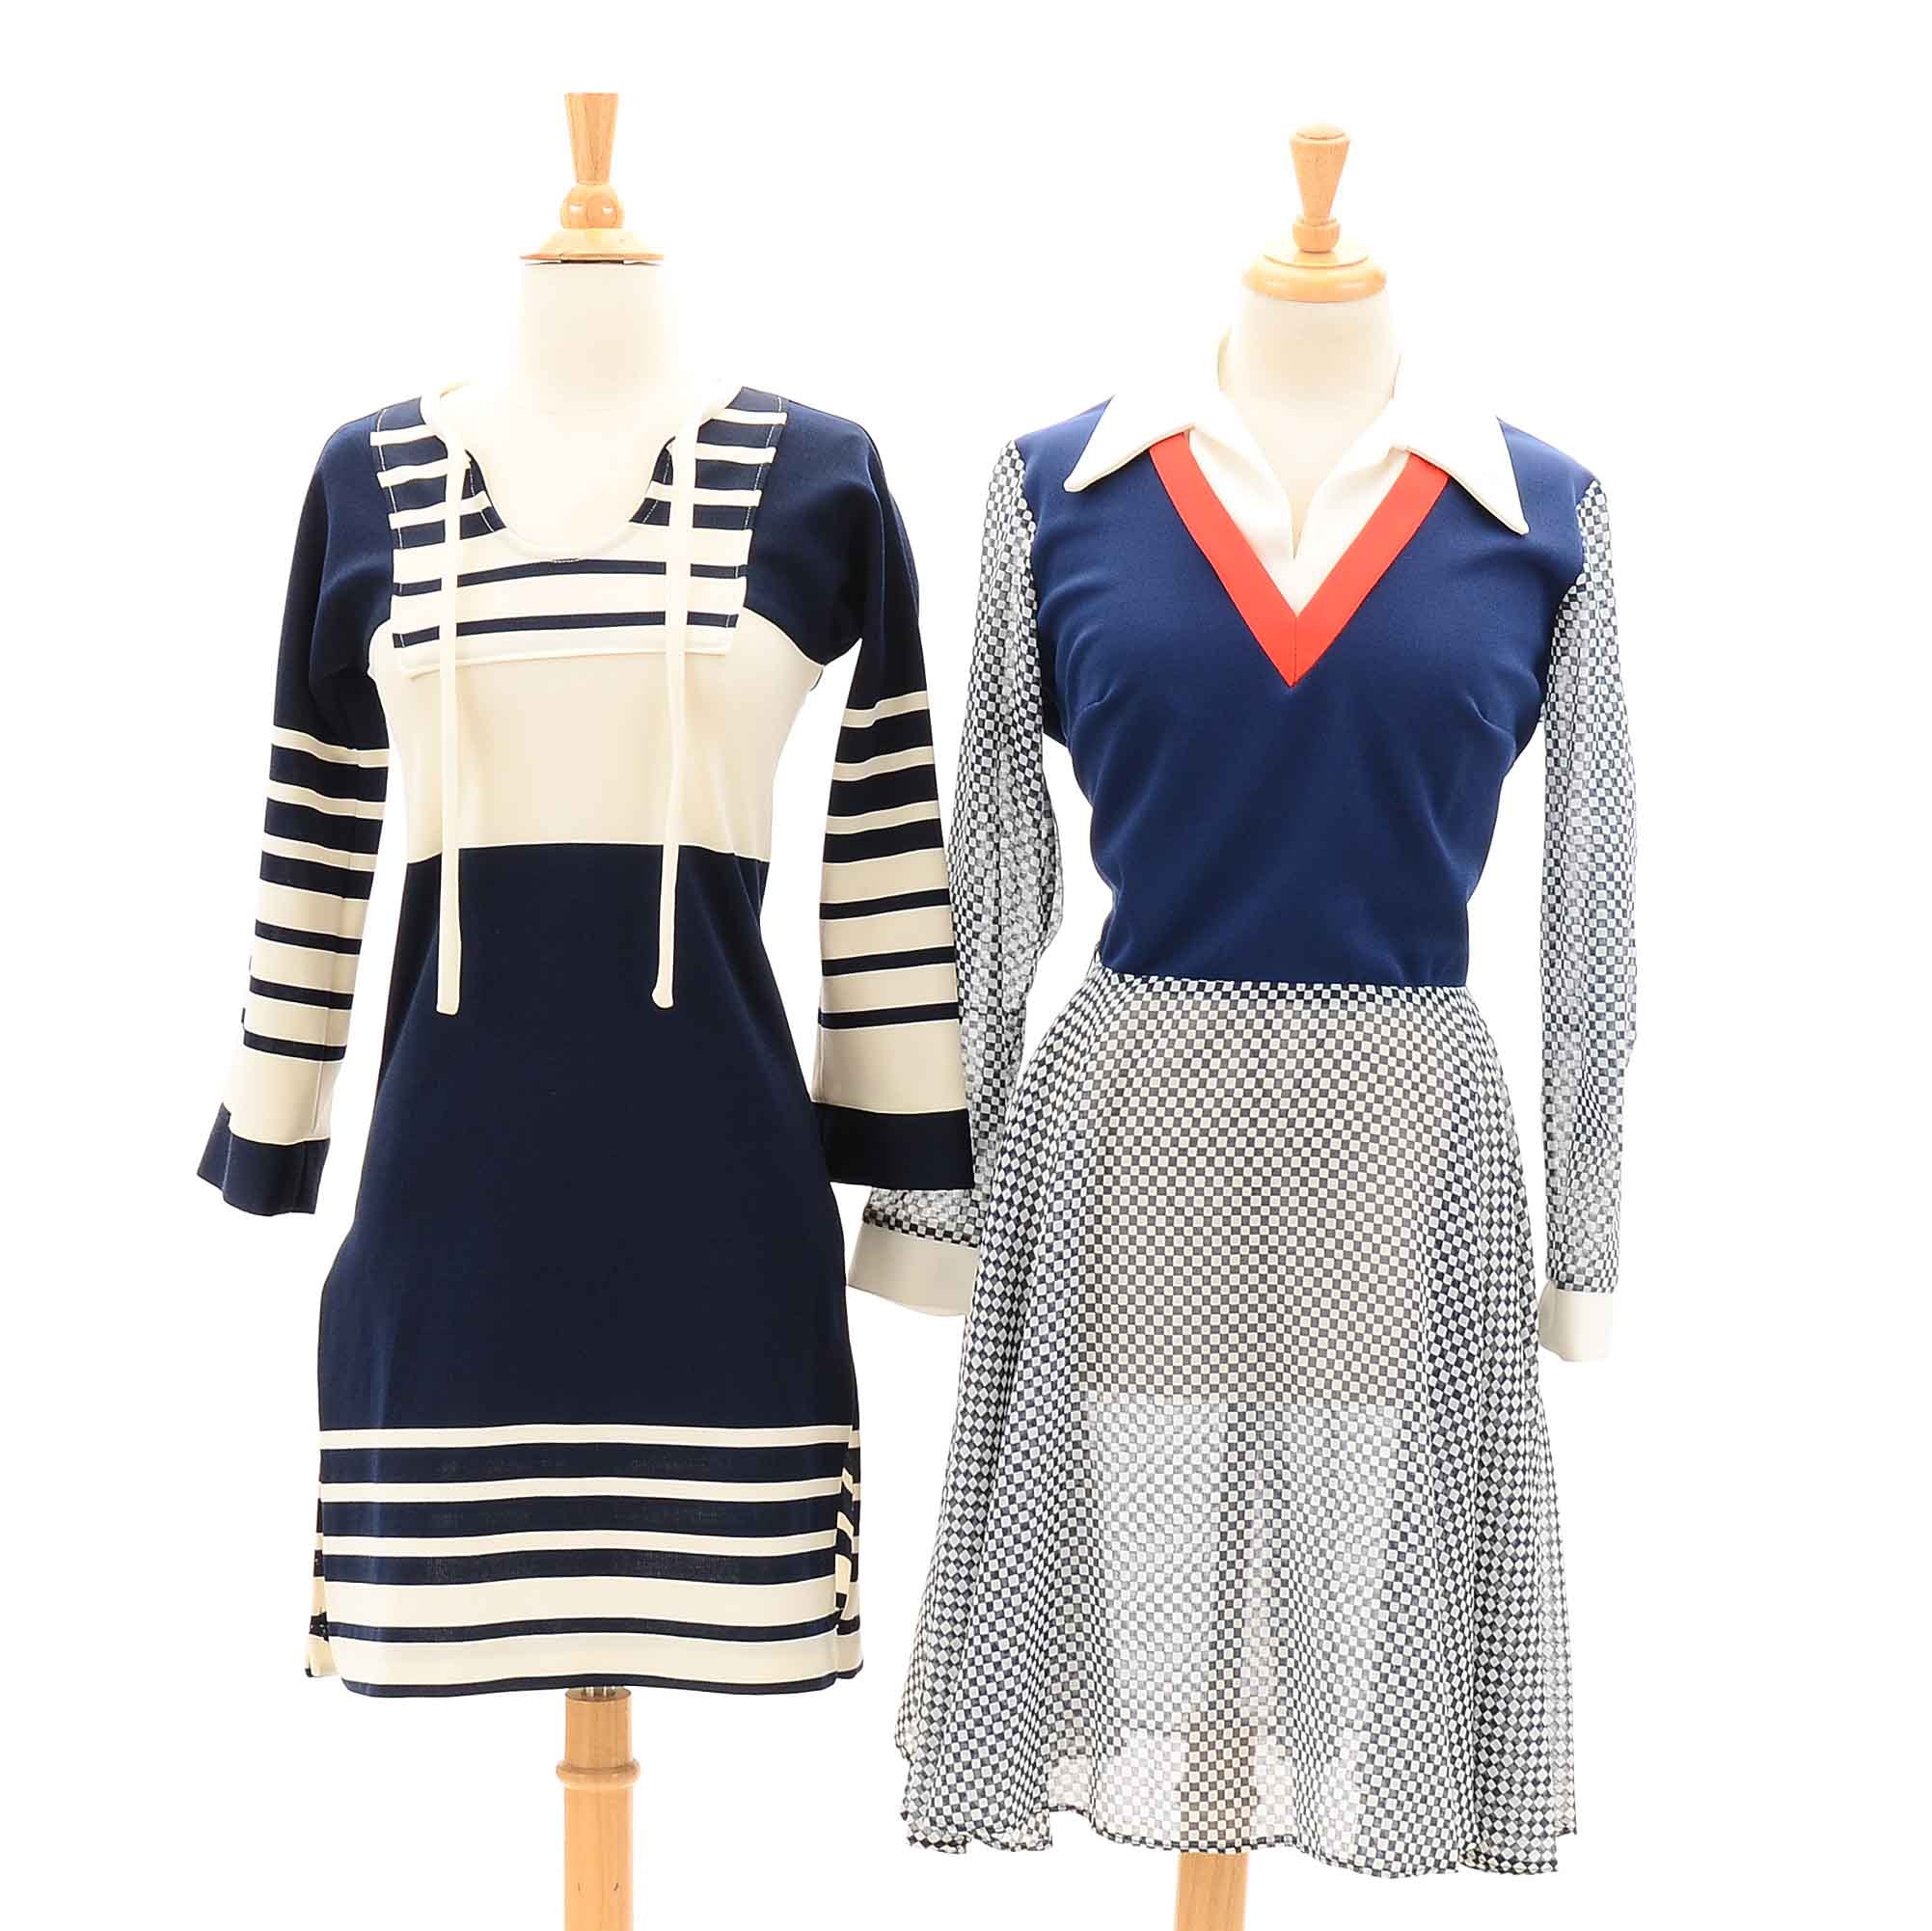 Vintage 1970s Dresses